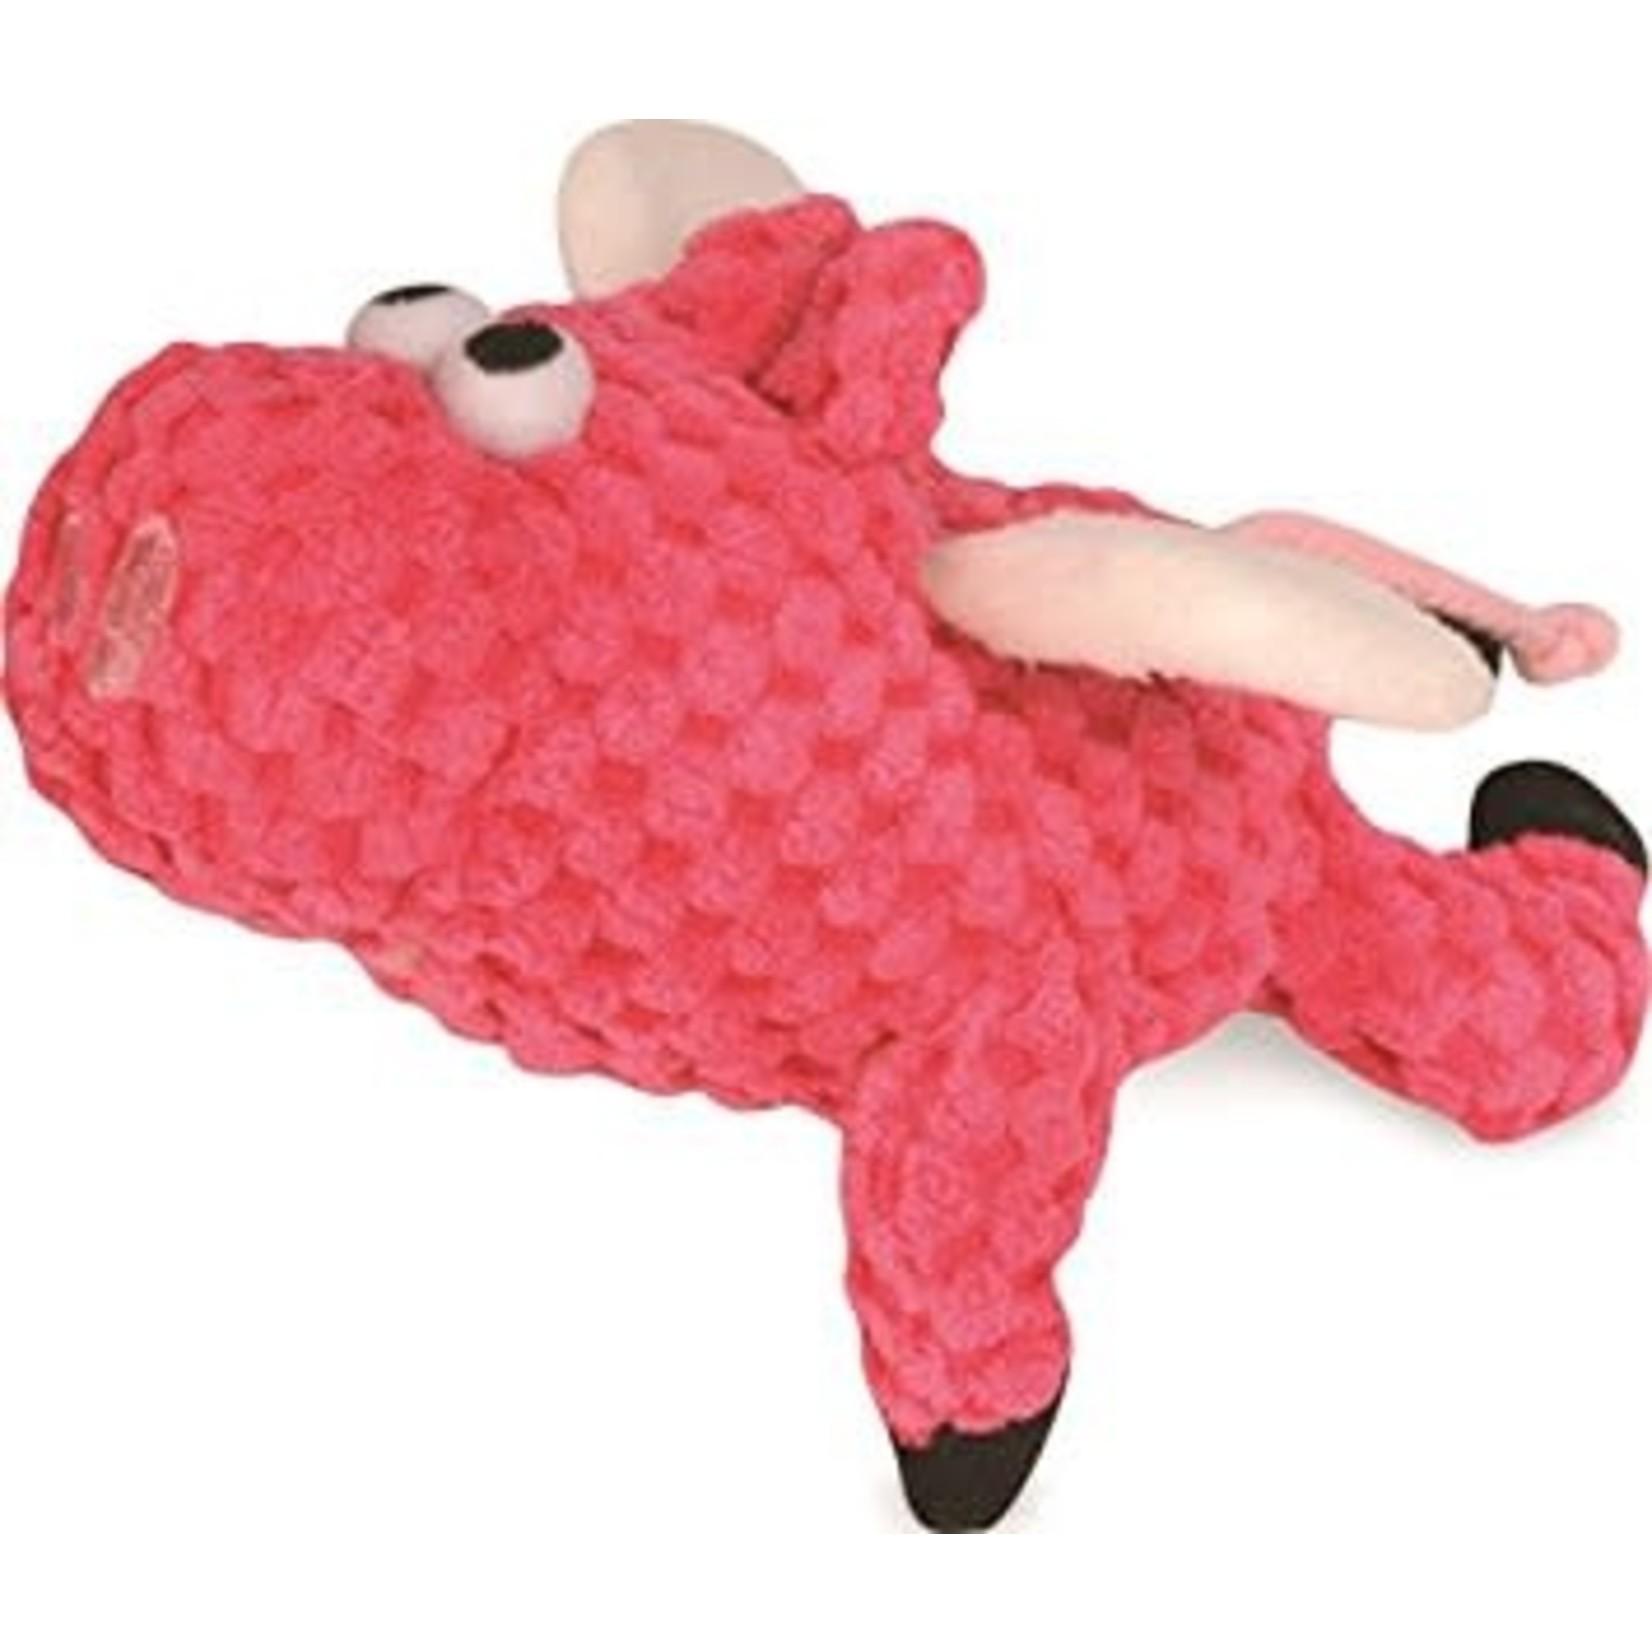 Worldwise/QPG/GoDog GoDog Just For Me Flying Pig Dog Toy